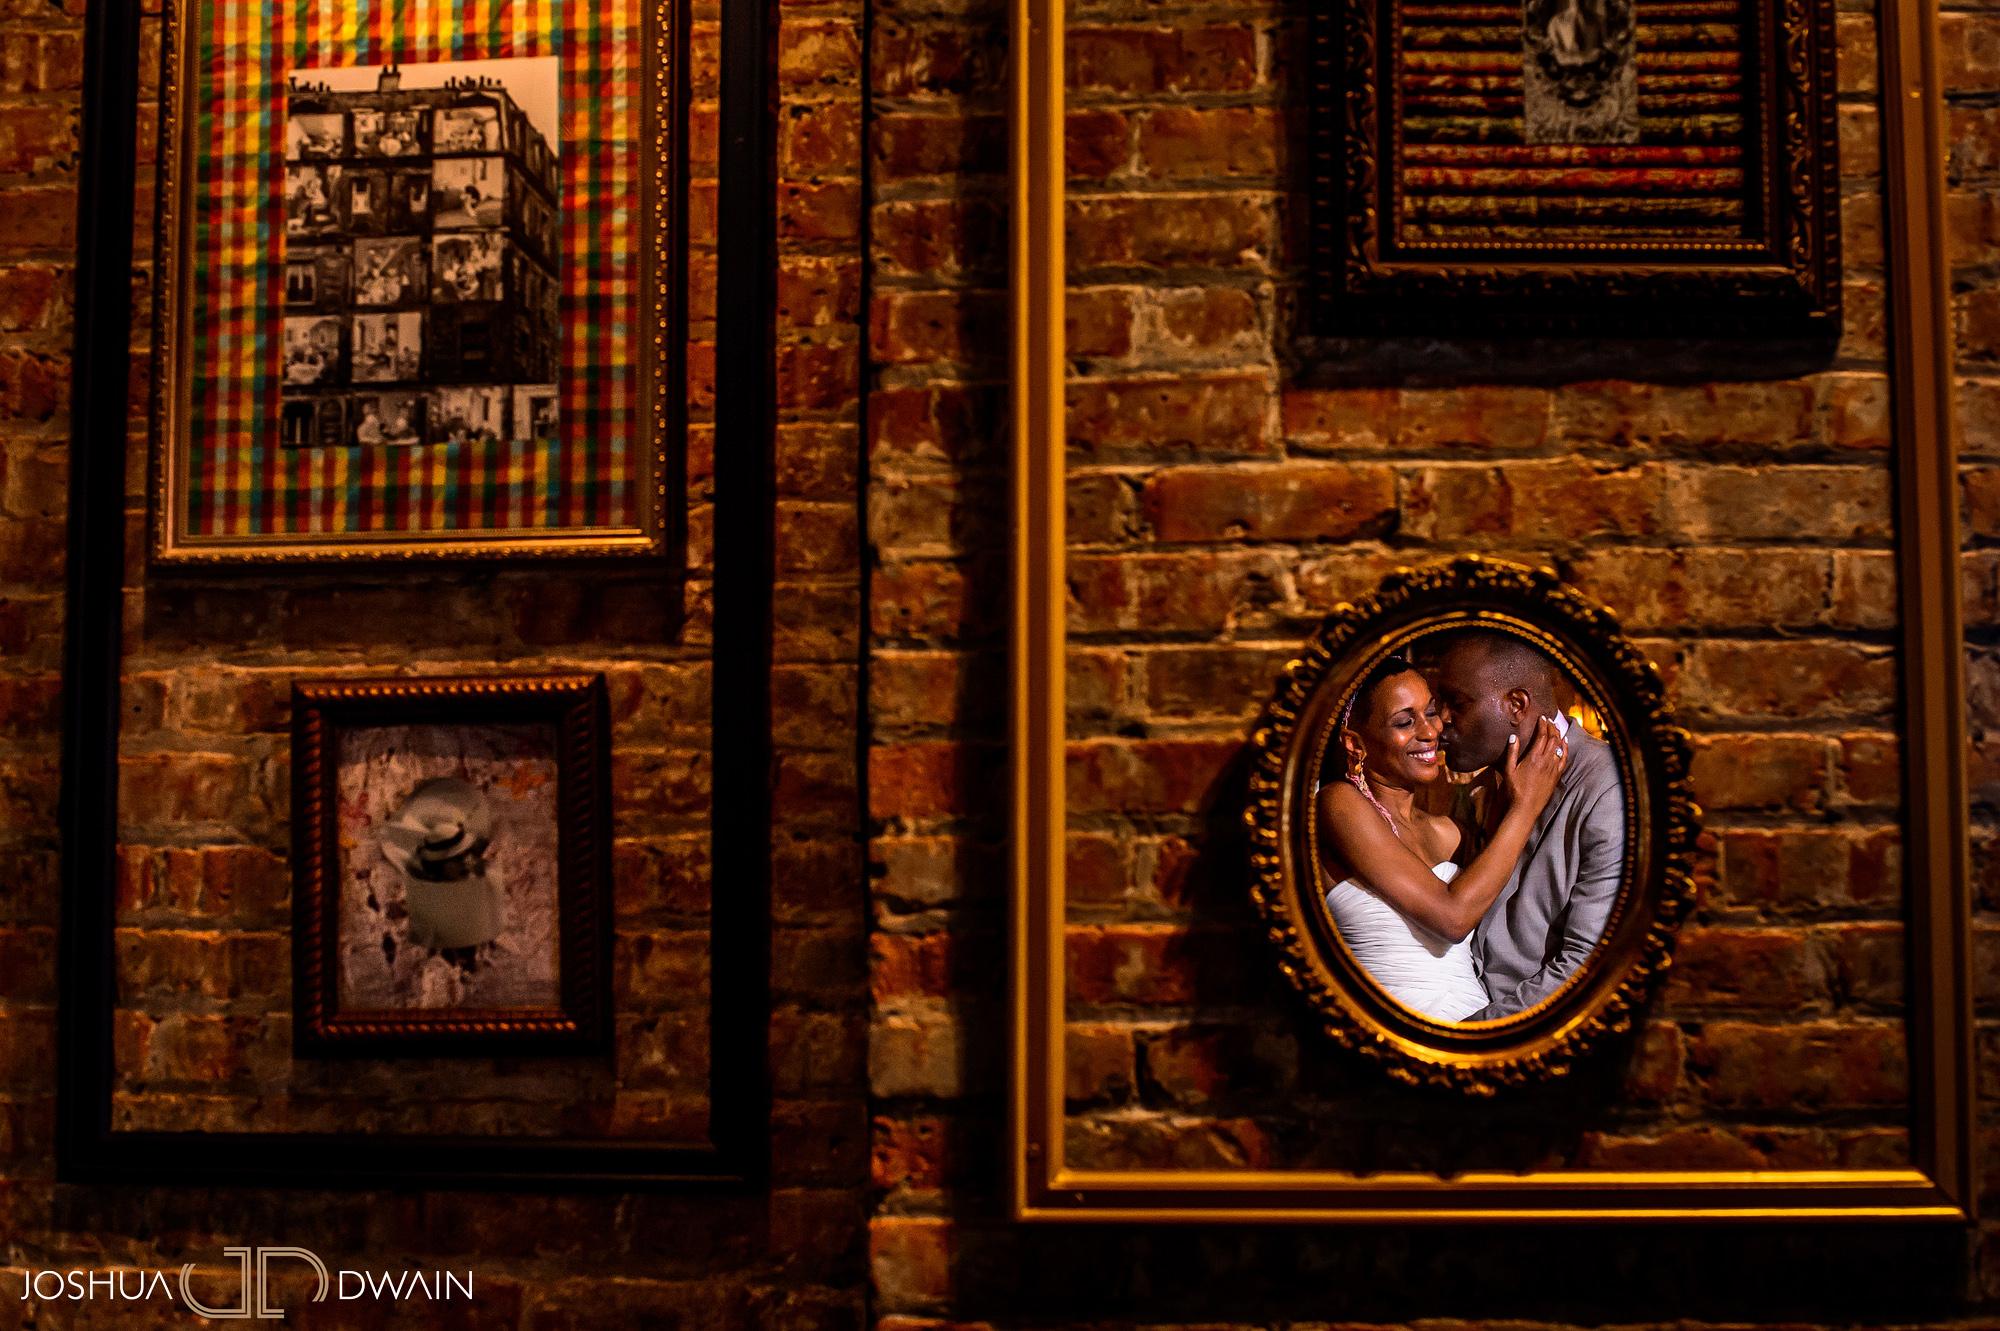 joshua-dwain-weddings-gallery-best-wedding-photographers-us-037